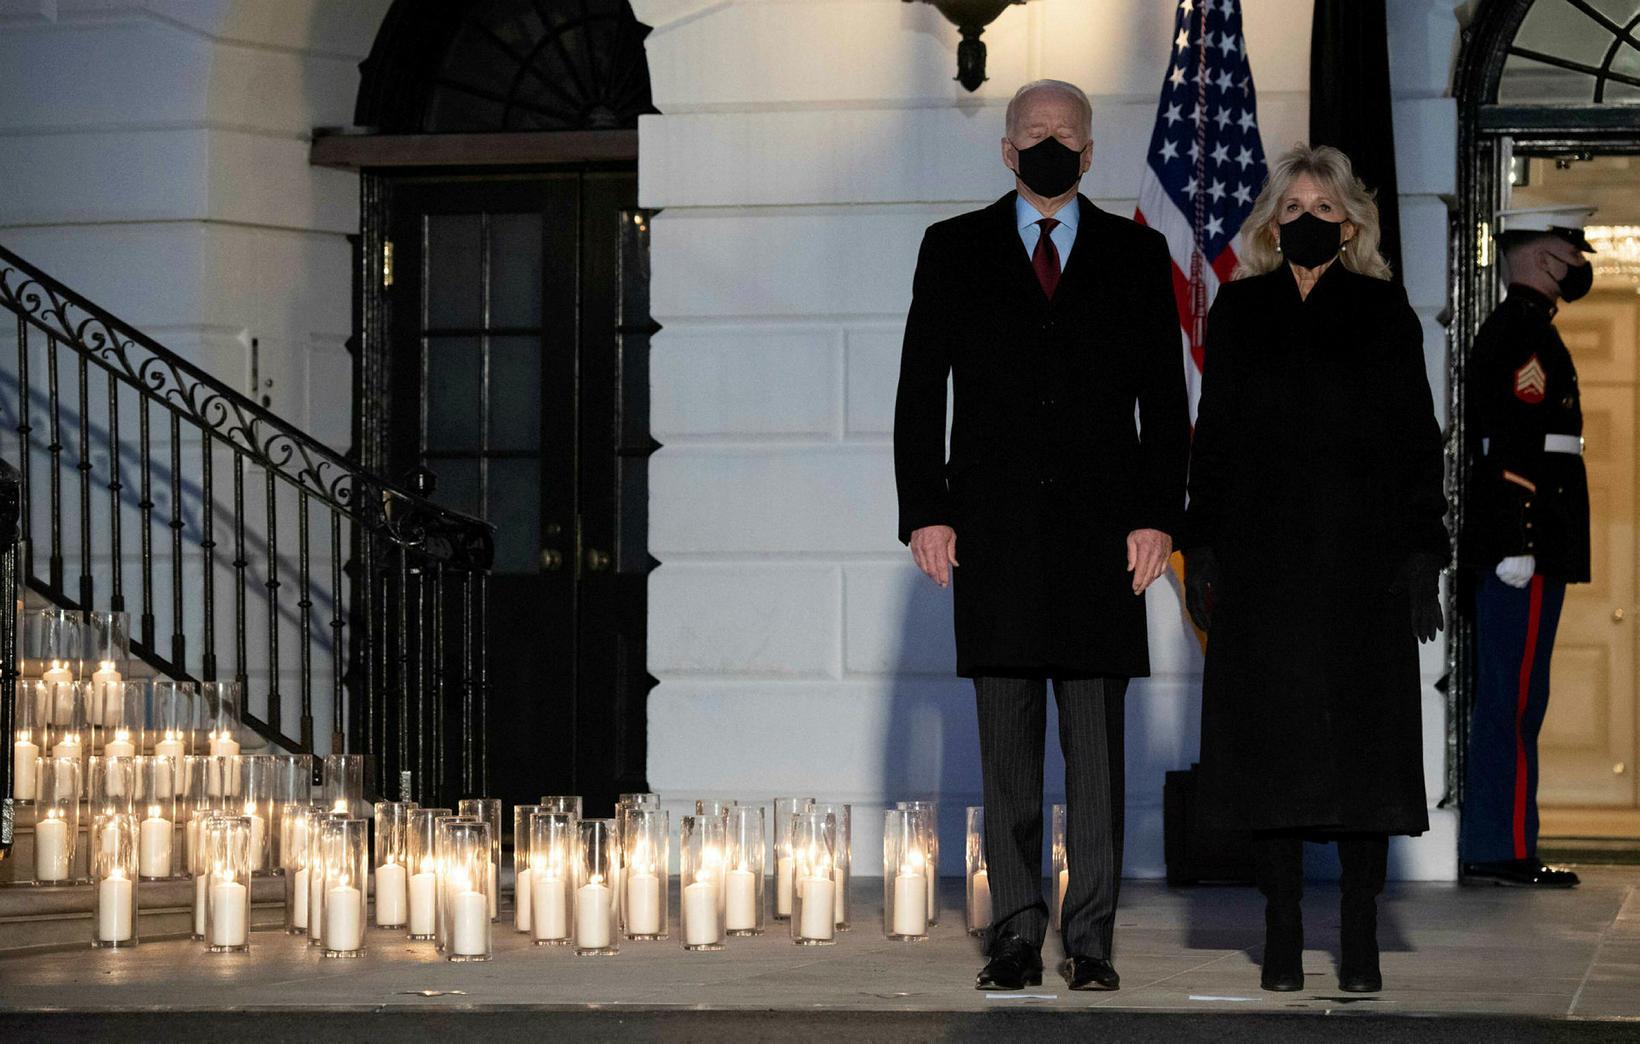 Joe og Jill Biden standa hjá kertunum.